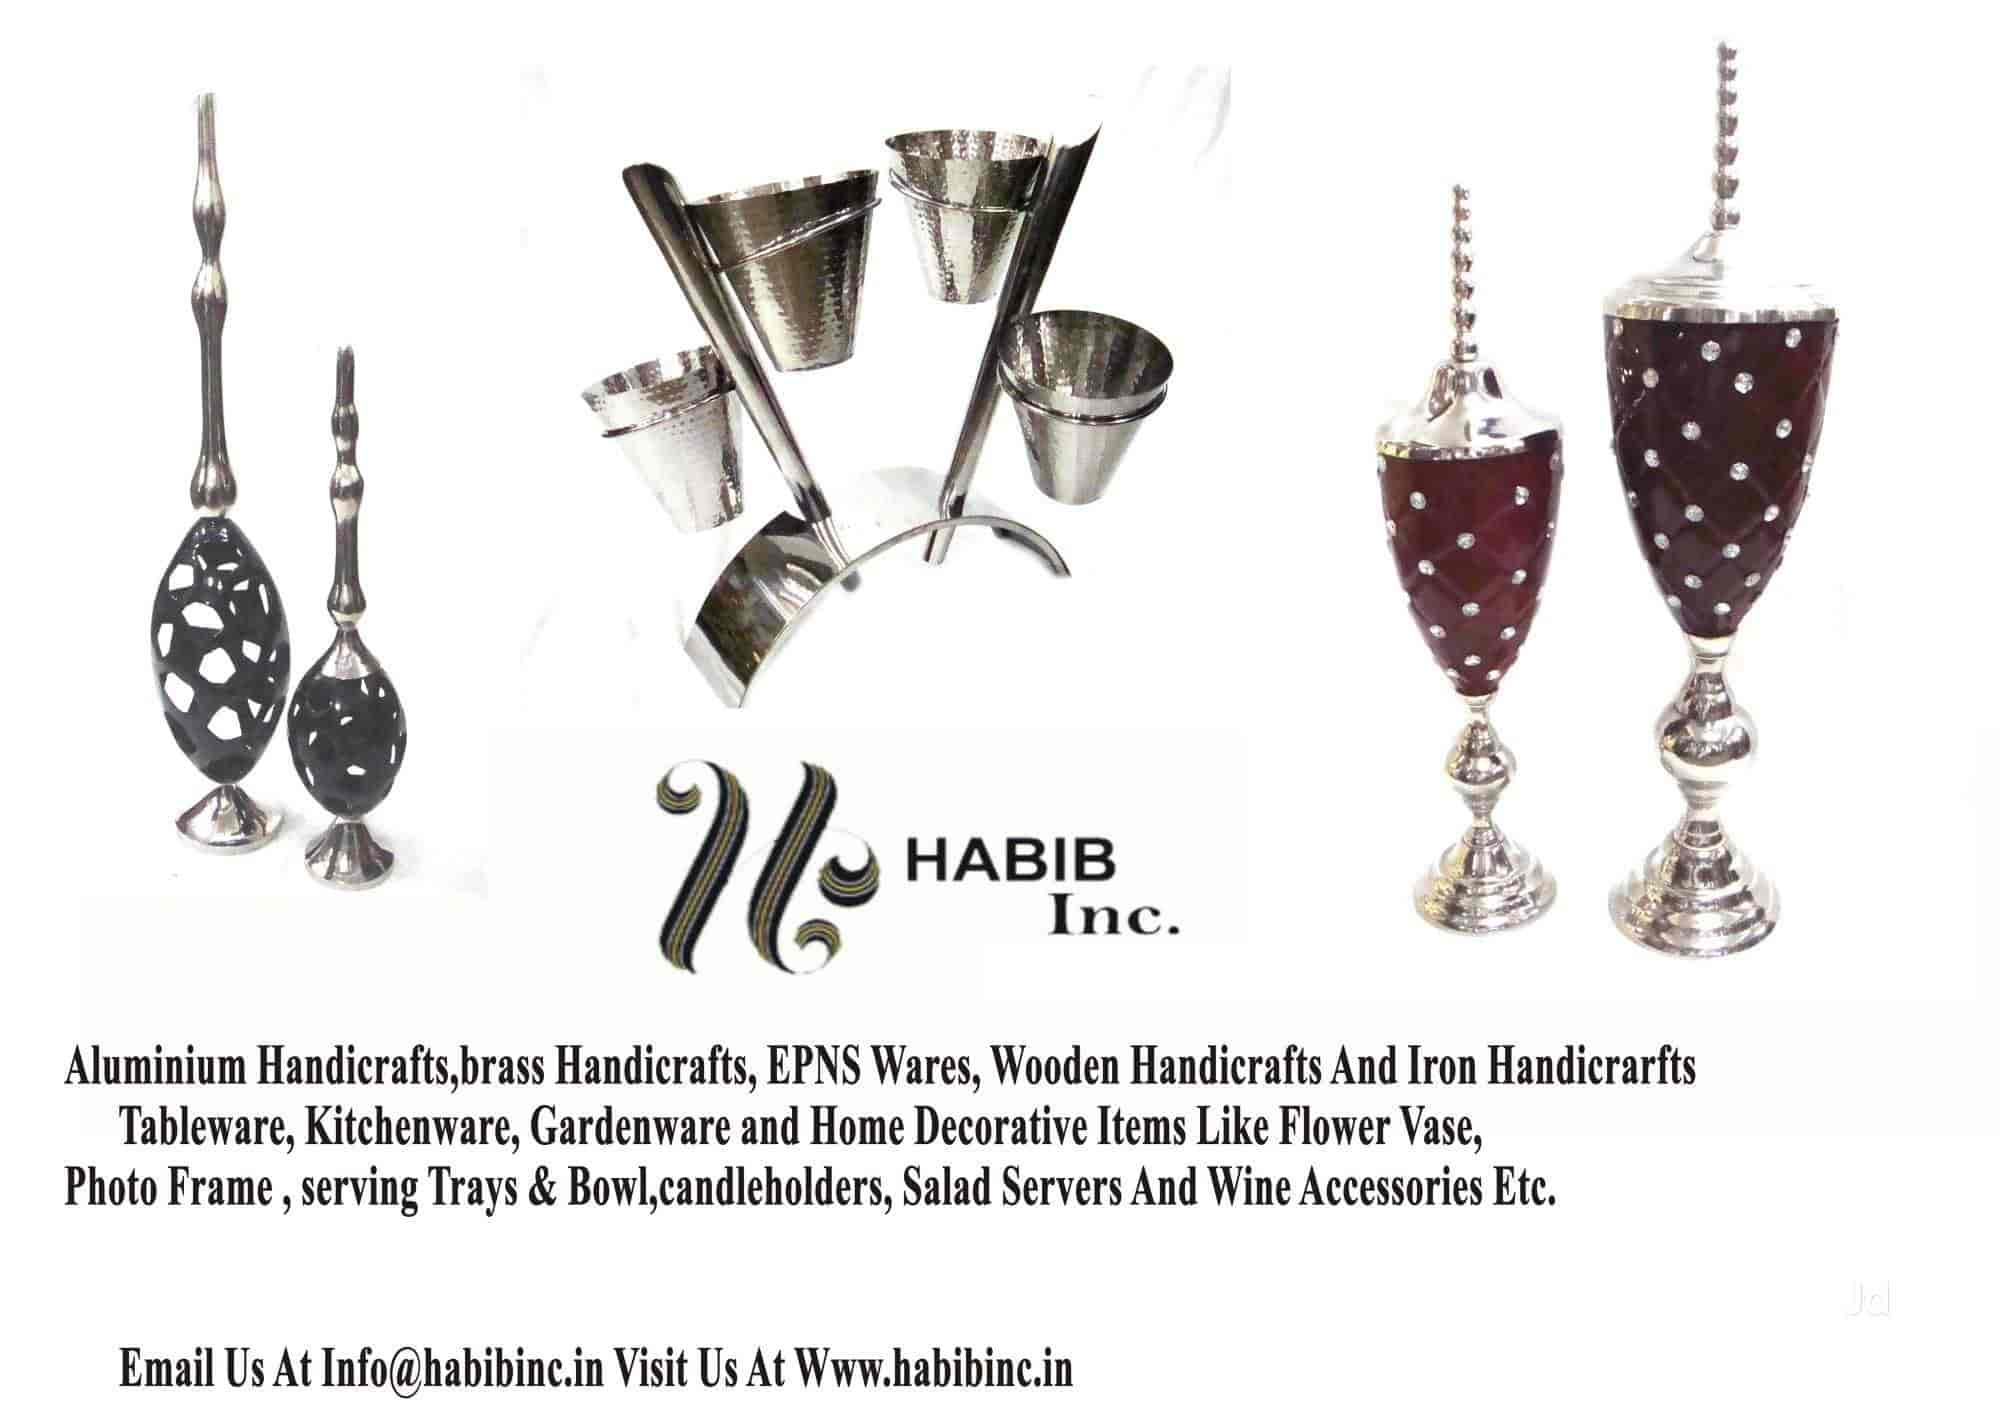 Habeeb Inc Mughal Pura Habib Inc Catering Display Counter